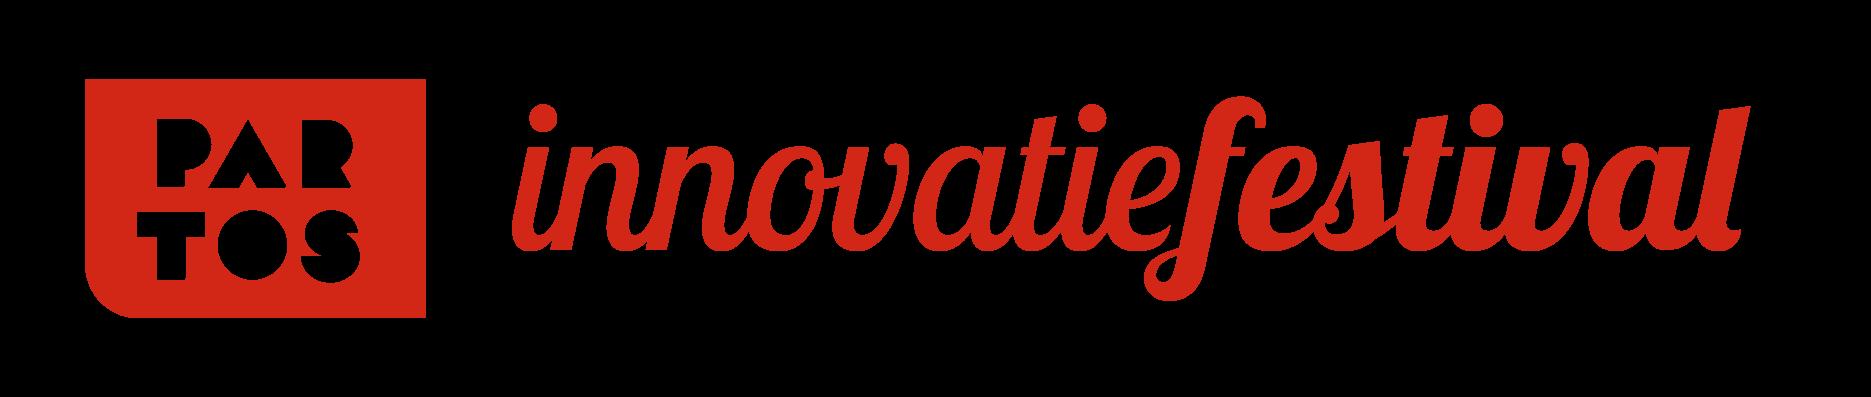 Partos Innovatiefestival logo